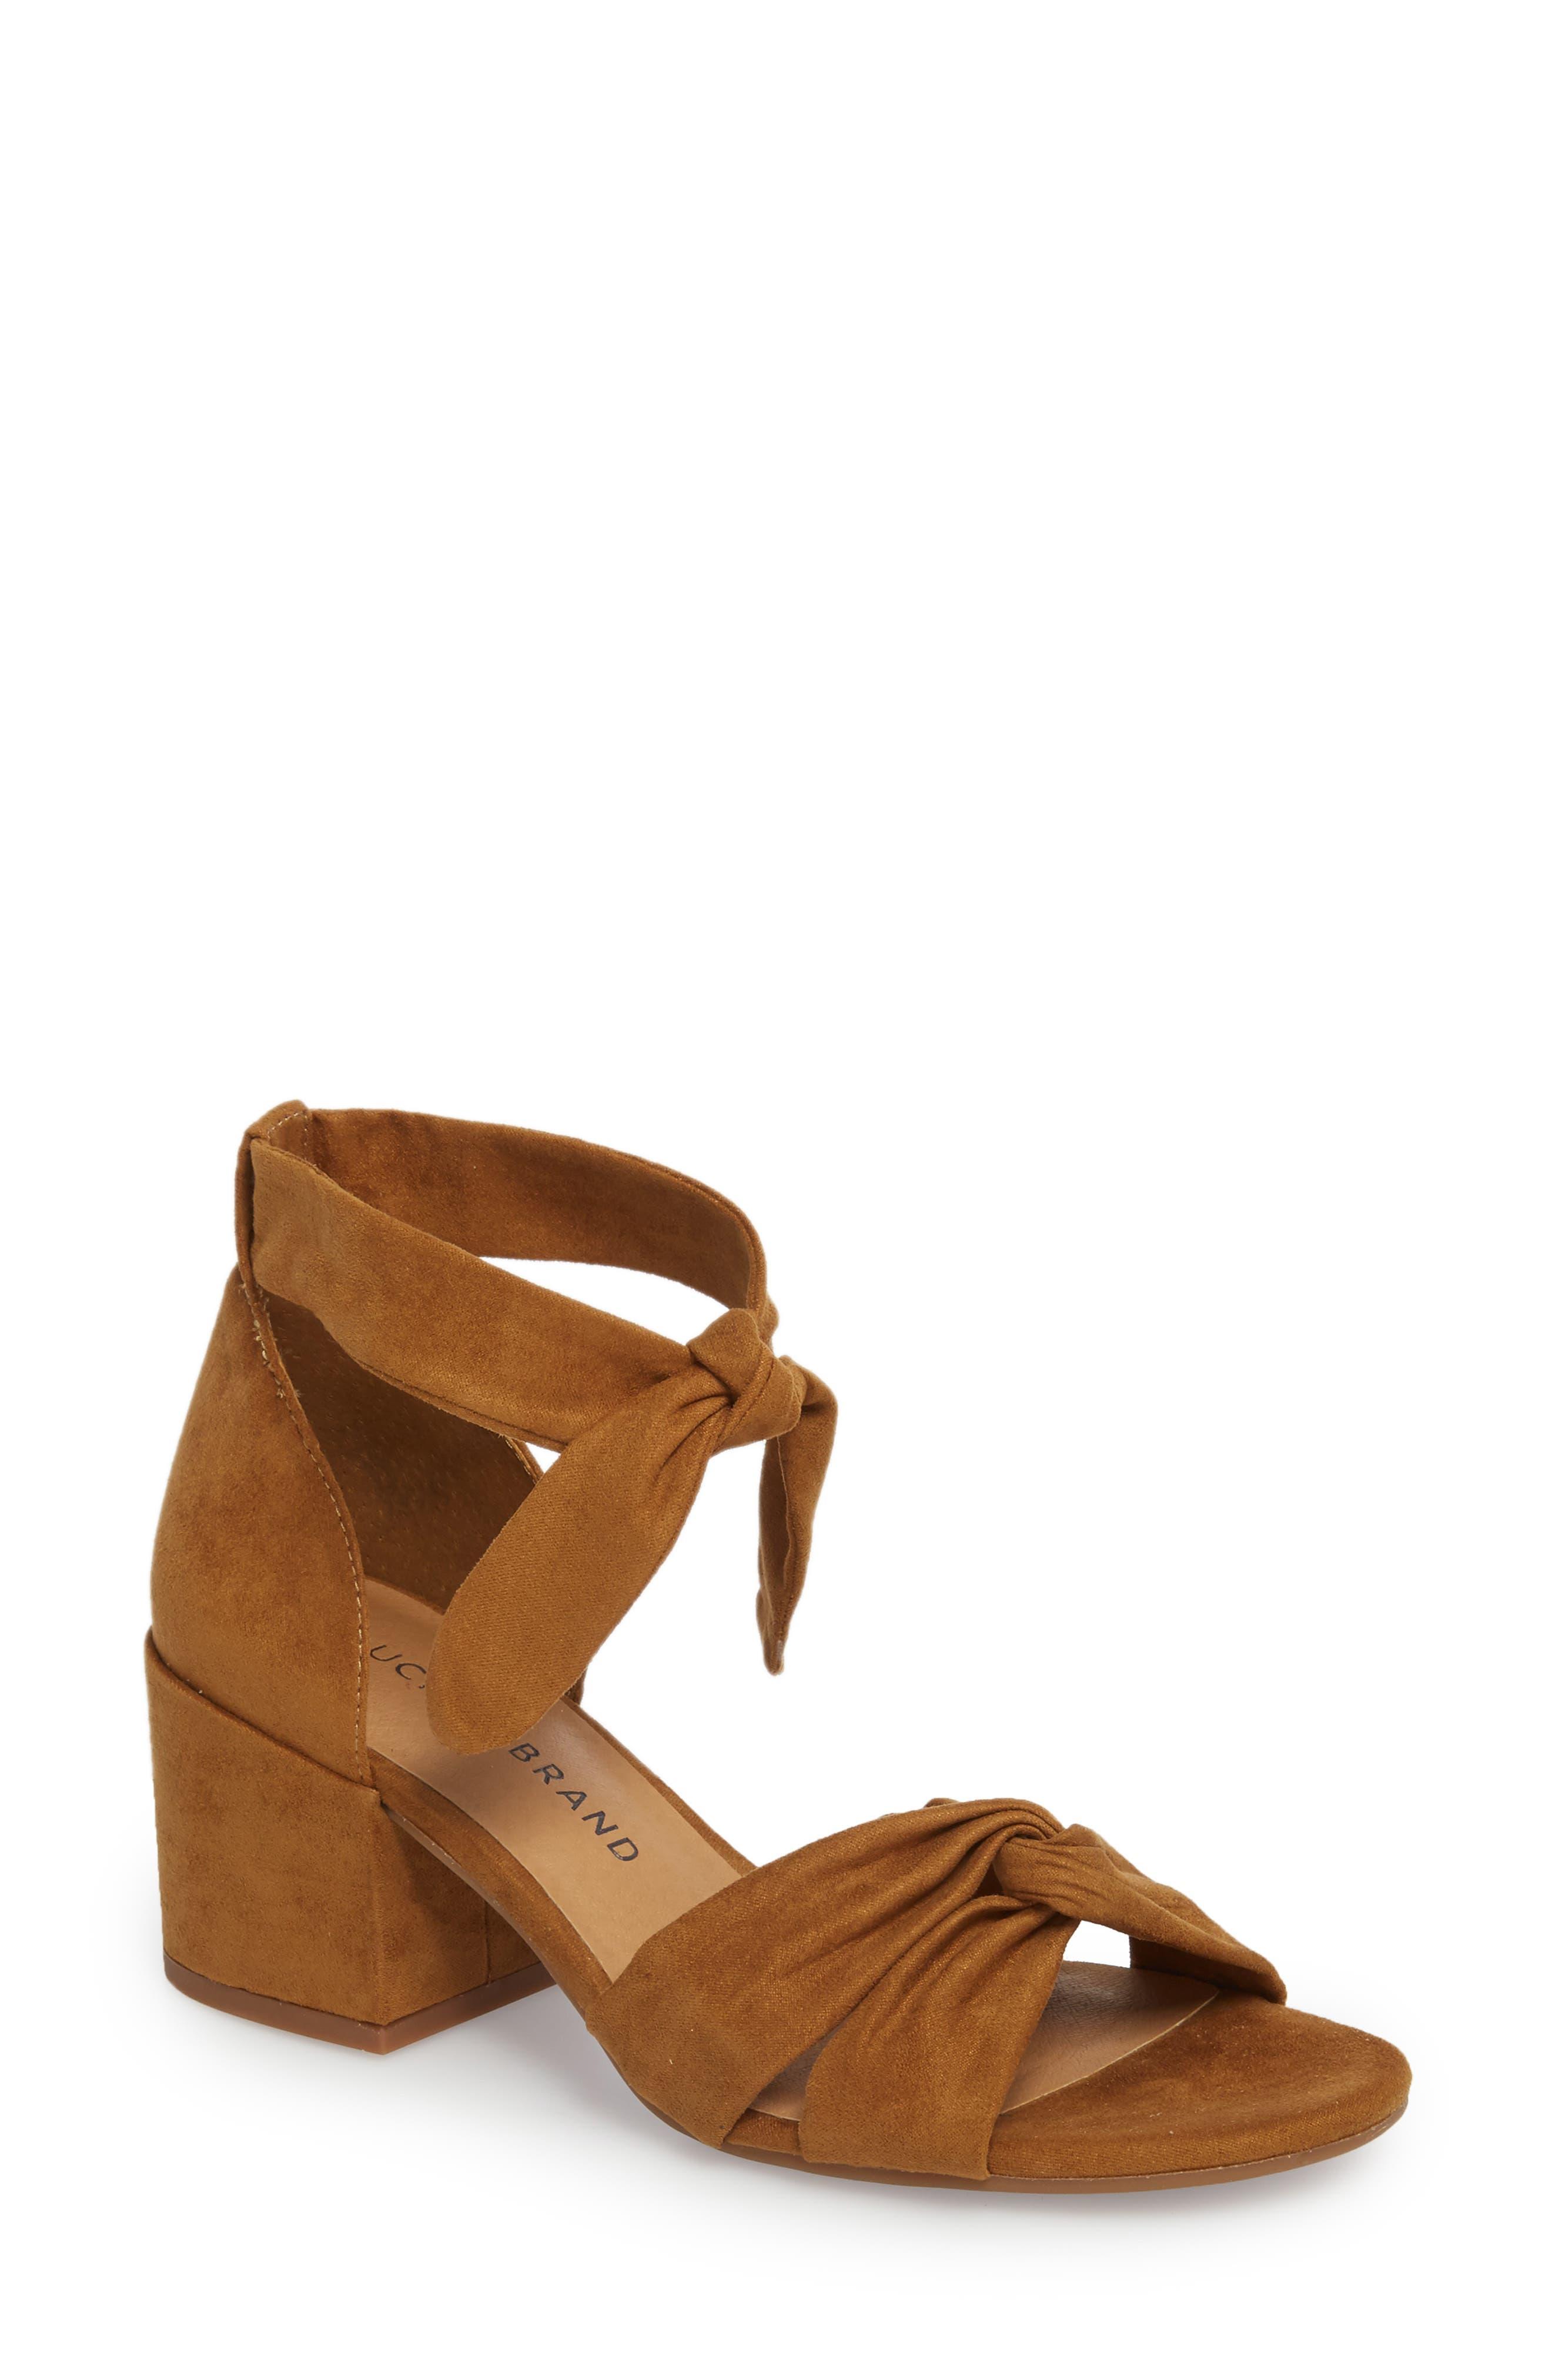 Xaylah Ankle Strap Sandal,                             Main thumbnail 2, color,